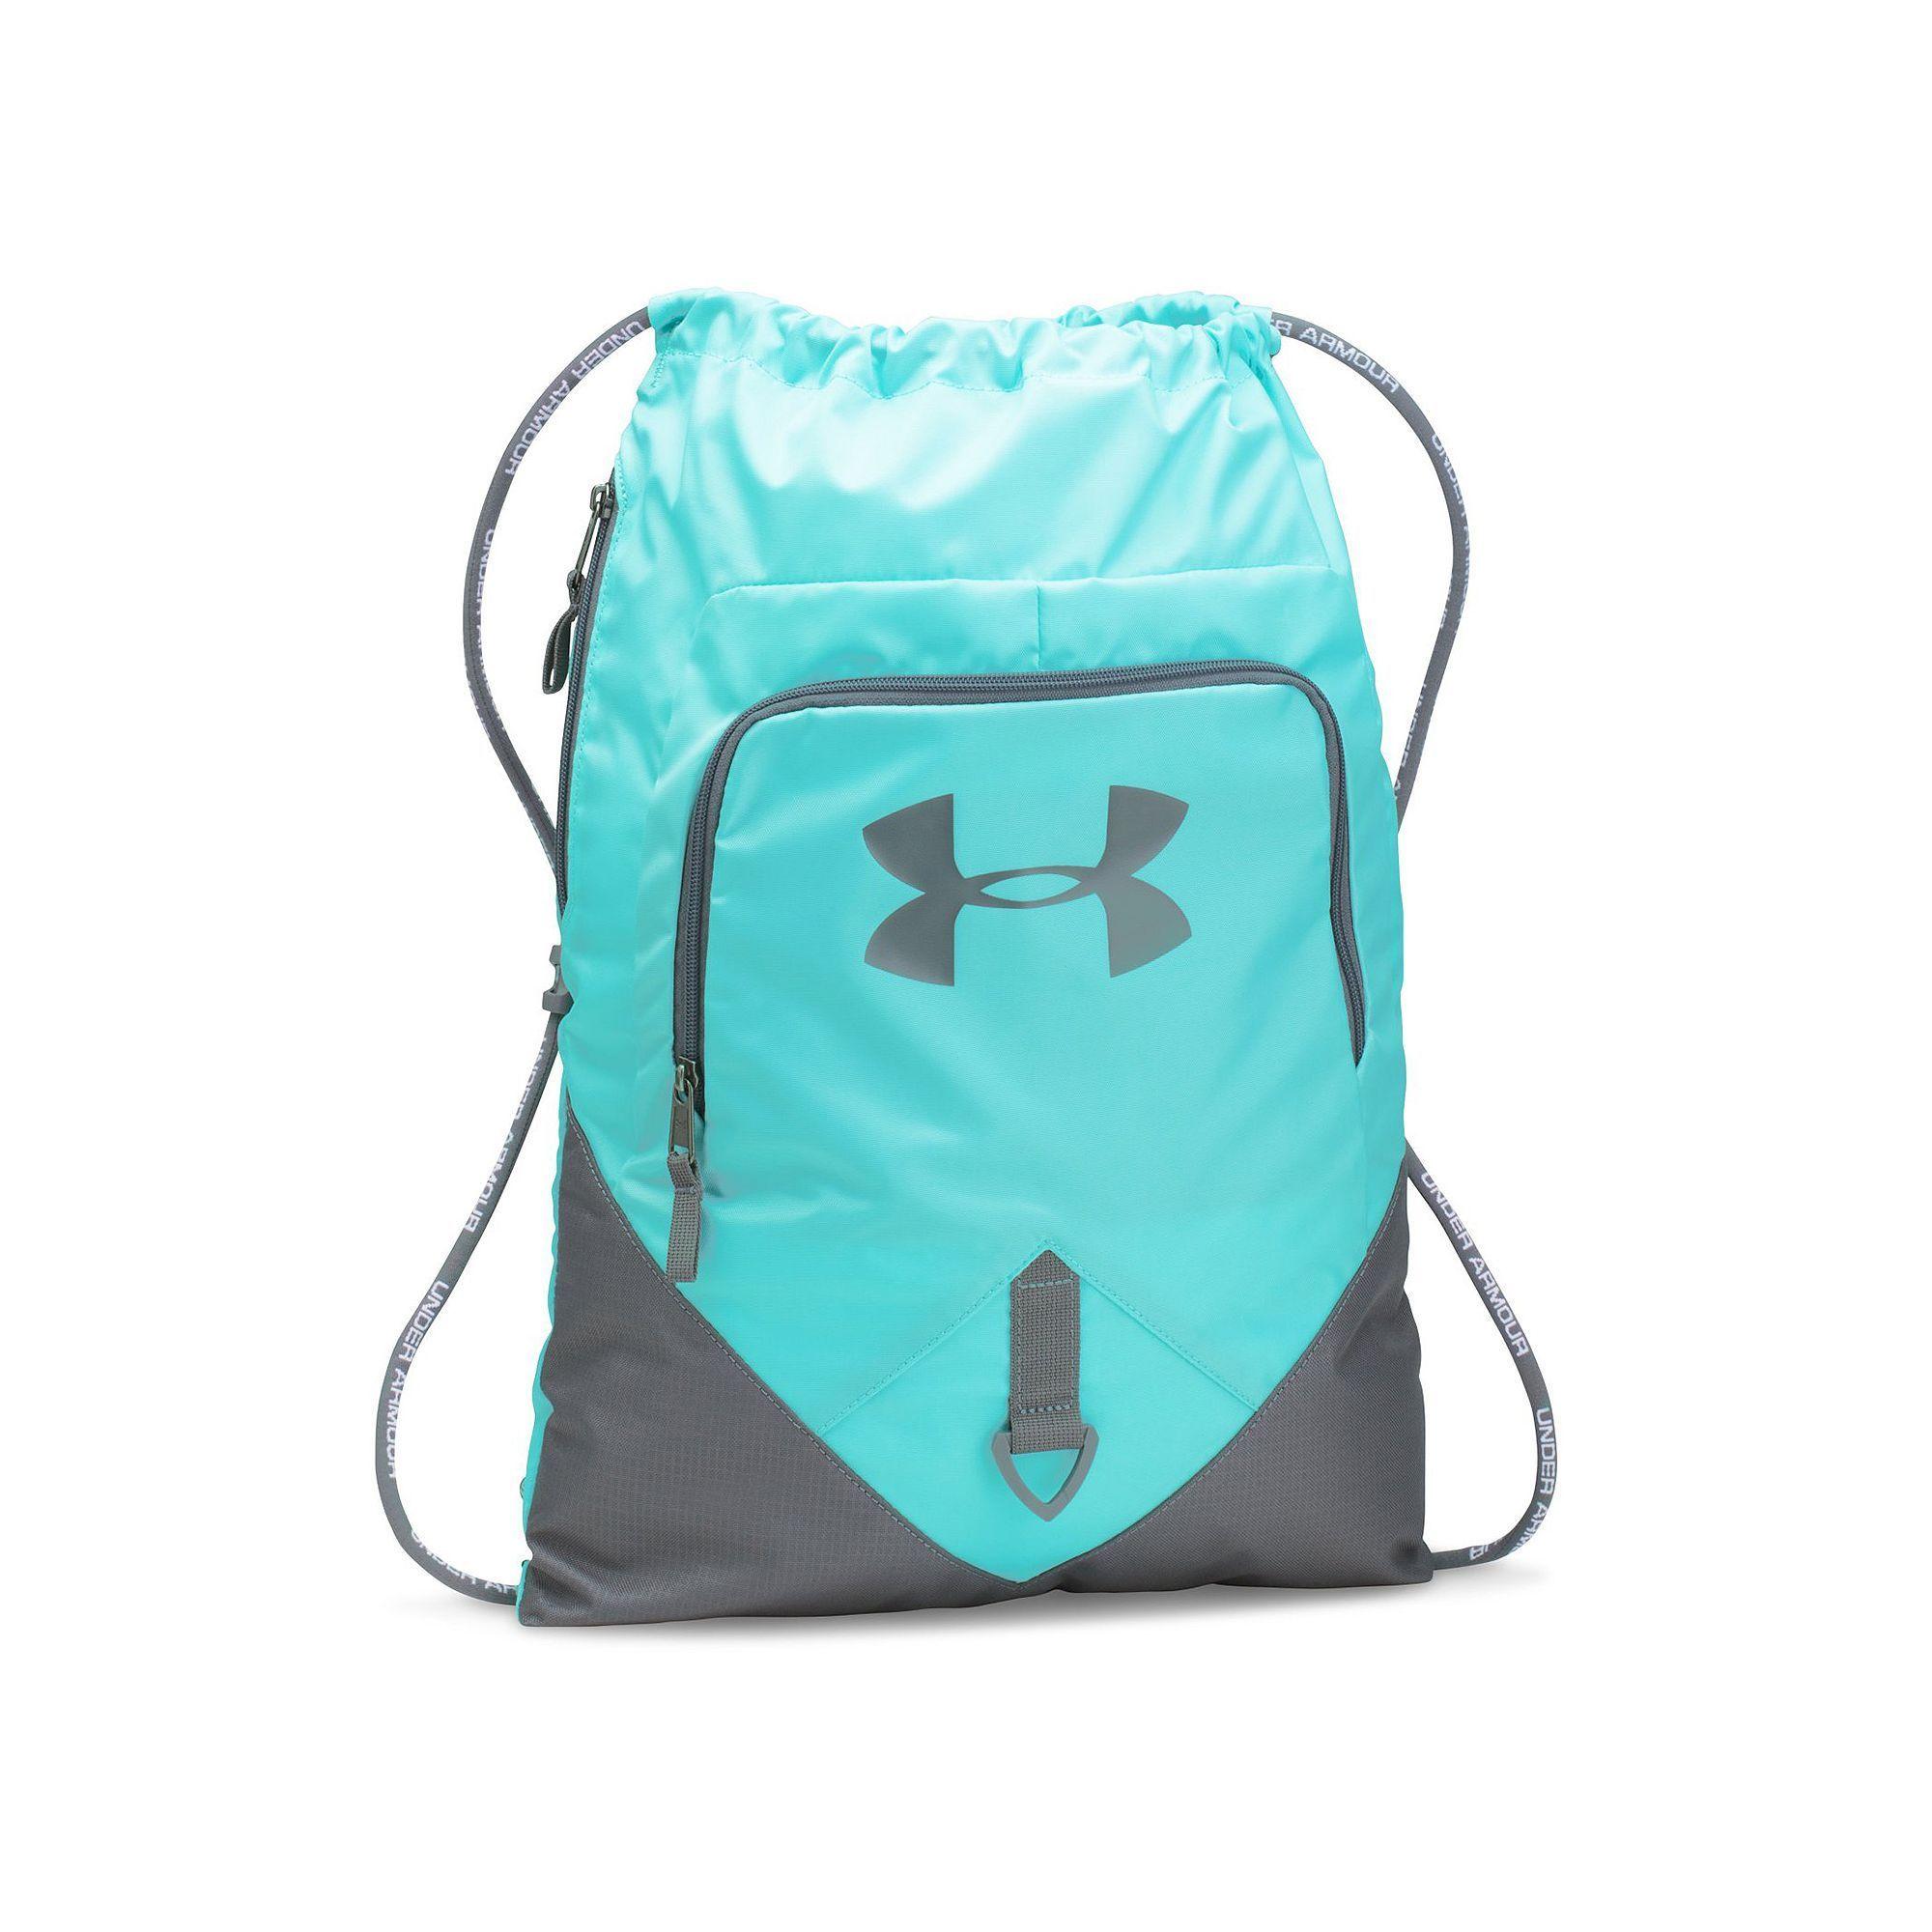 under armor drawstring bag